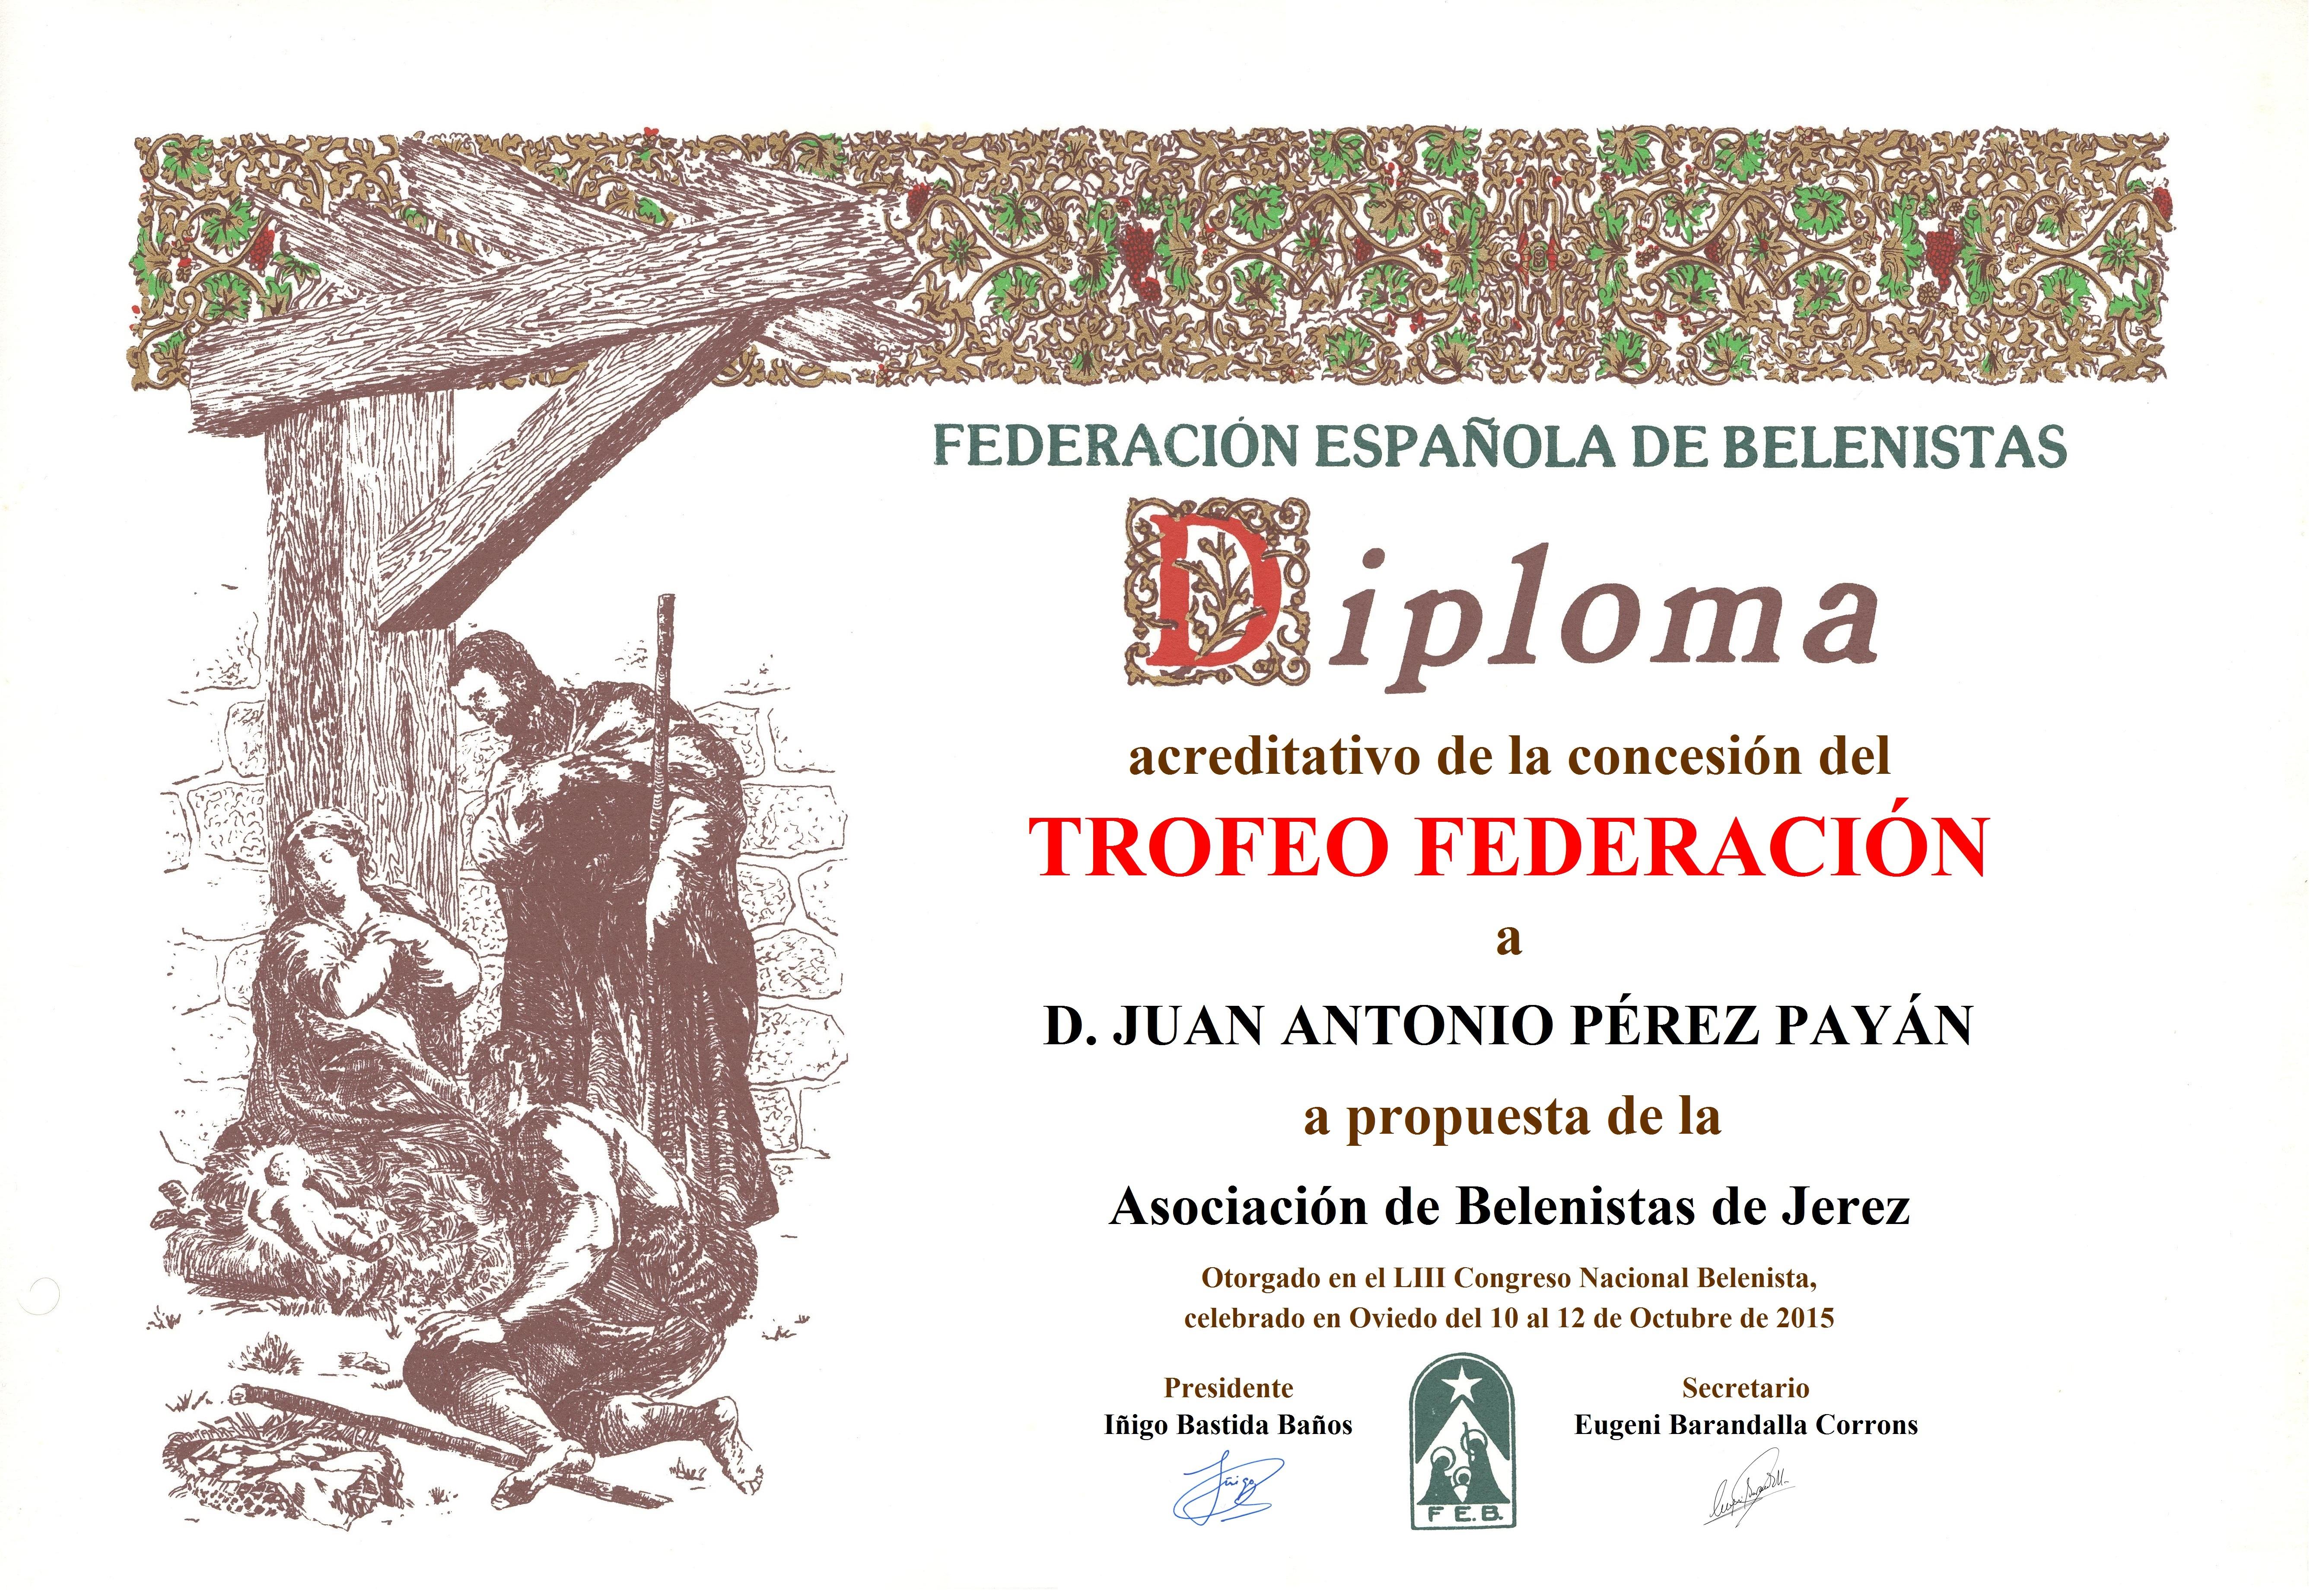 Diploma Trofeo FEB 2015 Juan Antonio Pérez Payán